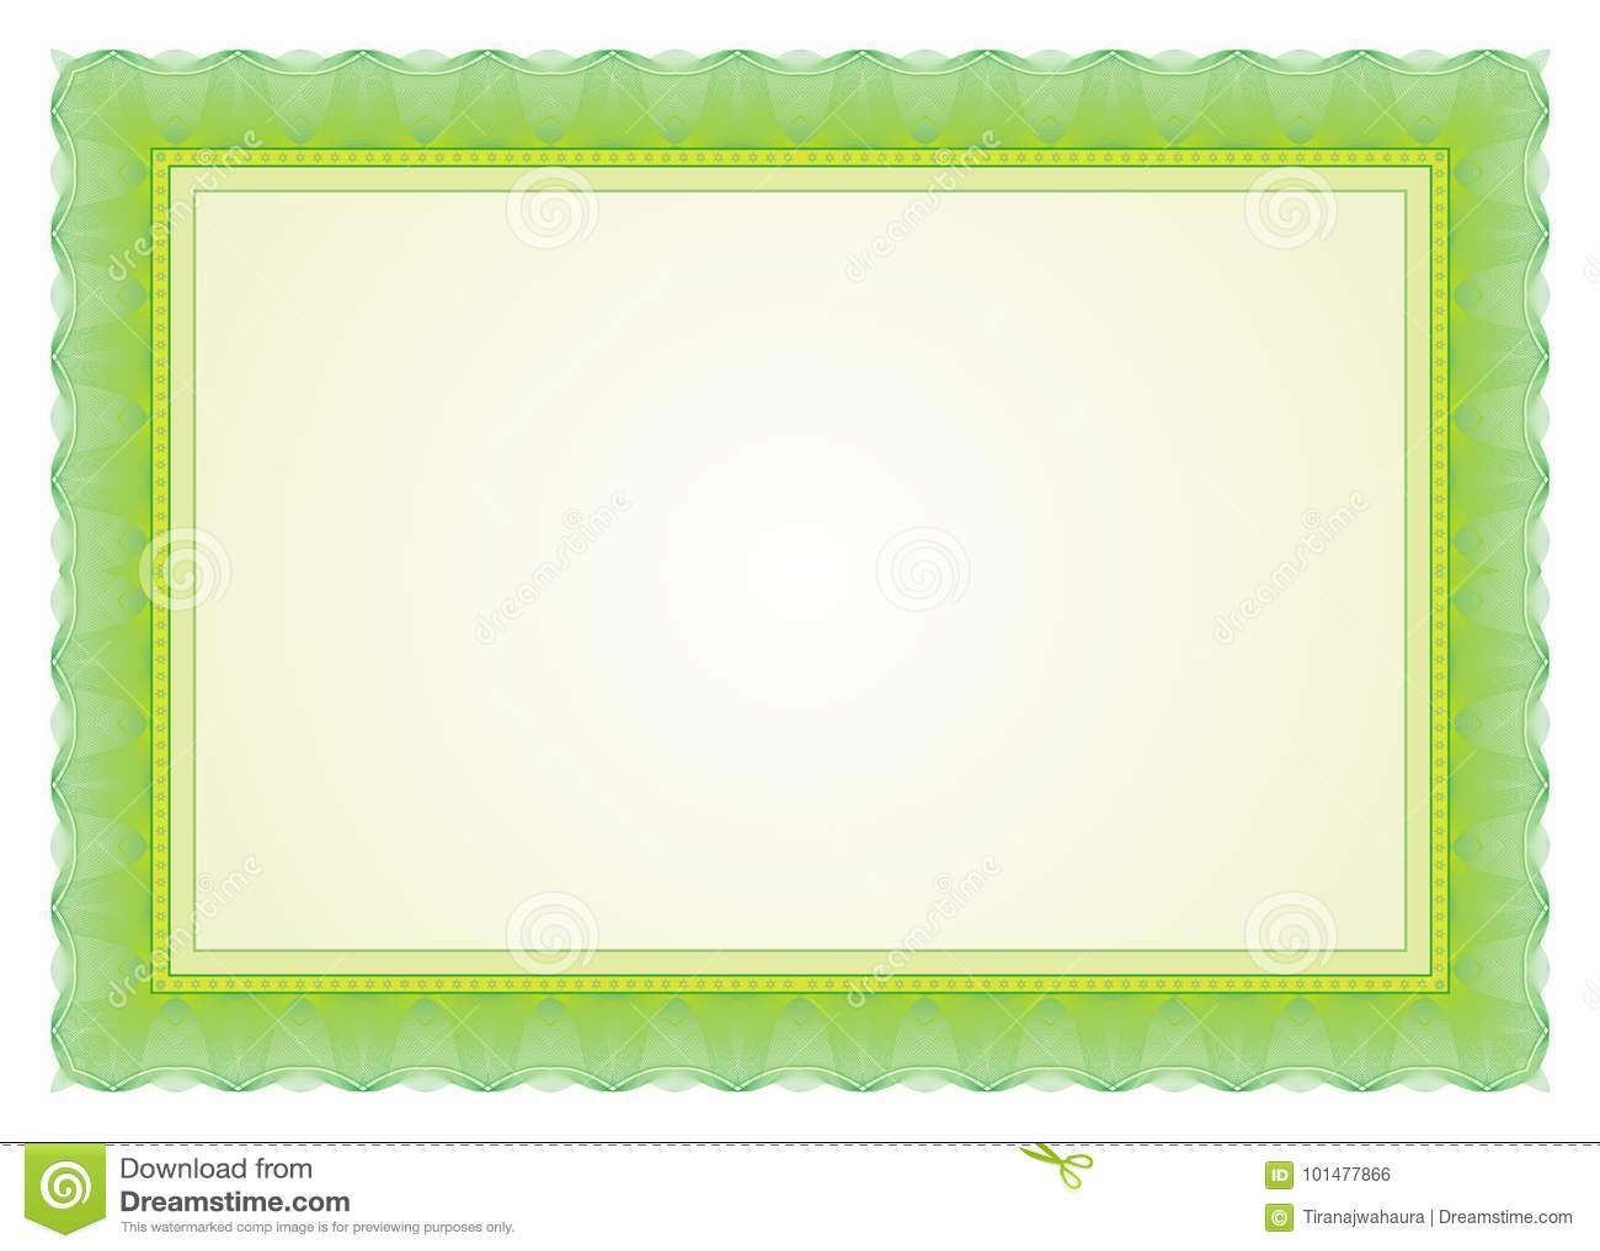 Certificate Frame Border Stock Vector Illustration Of Decoration